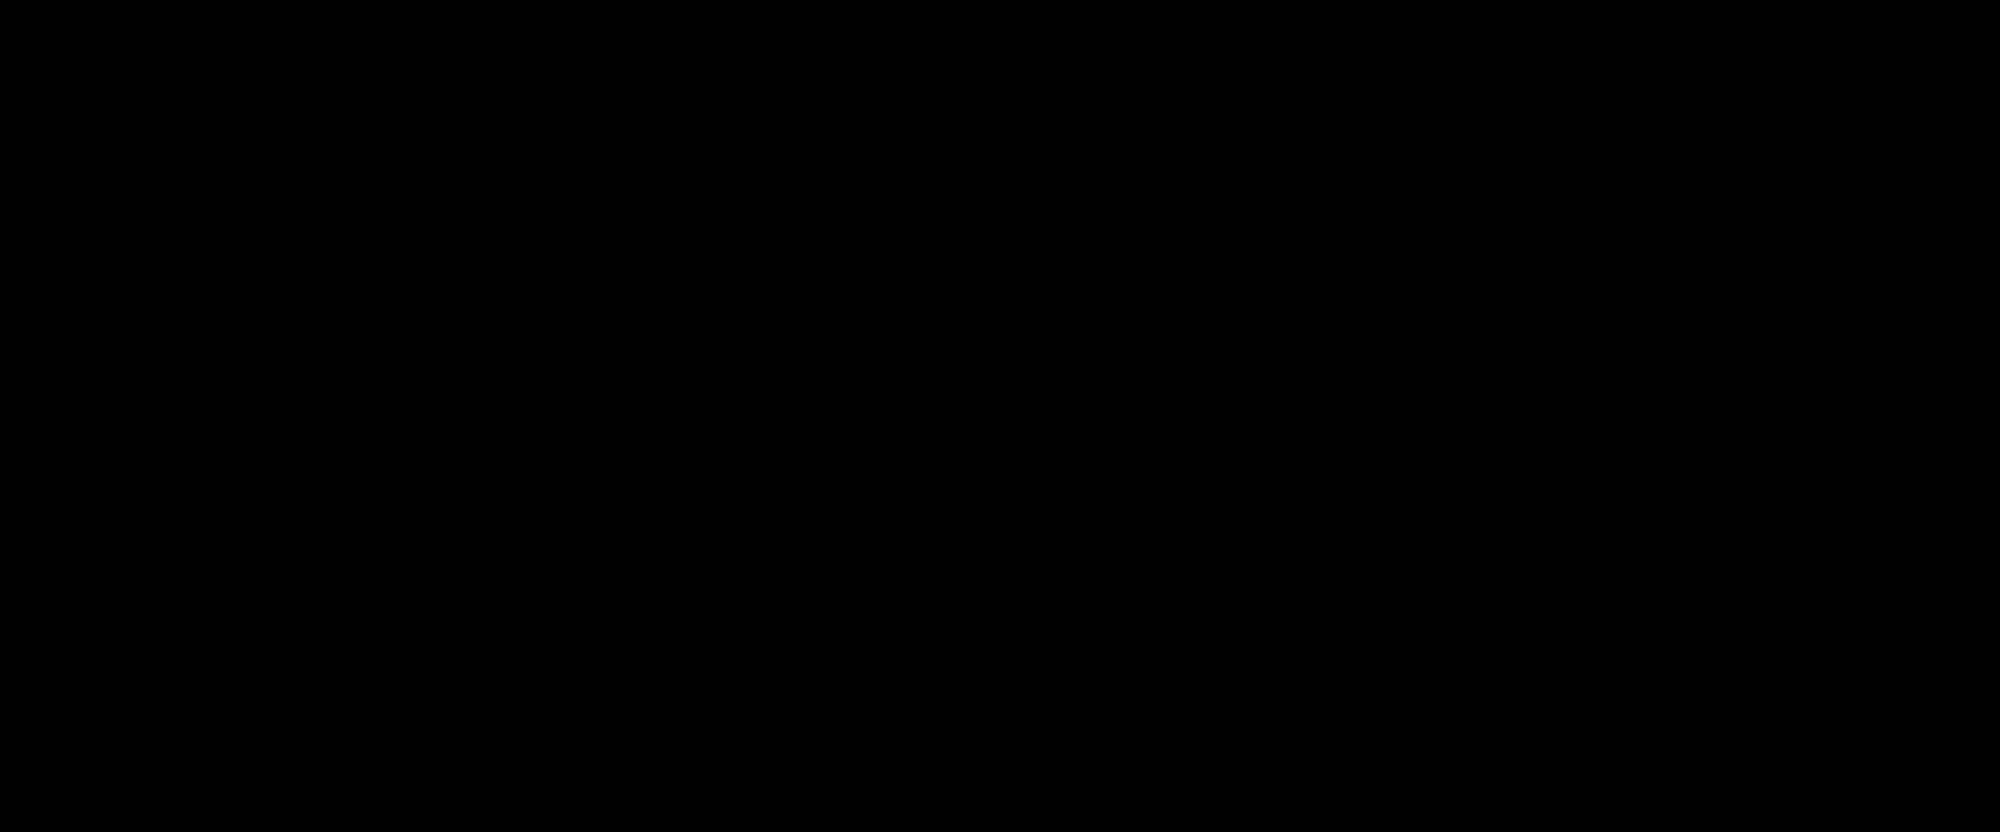 Sunrays HD PNG - 92841